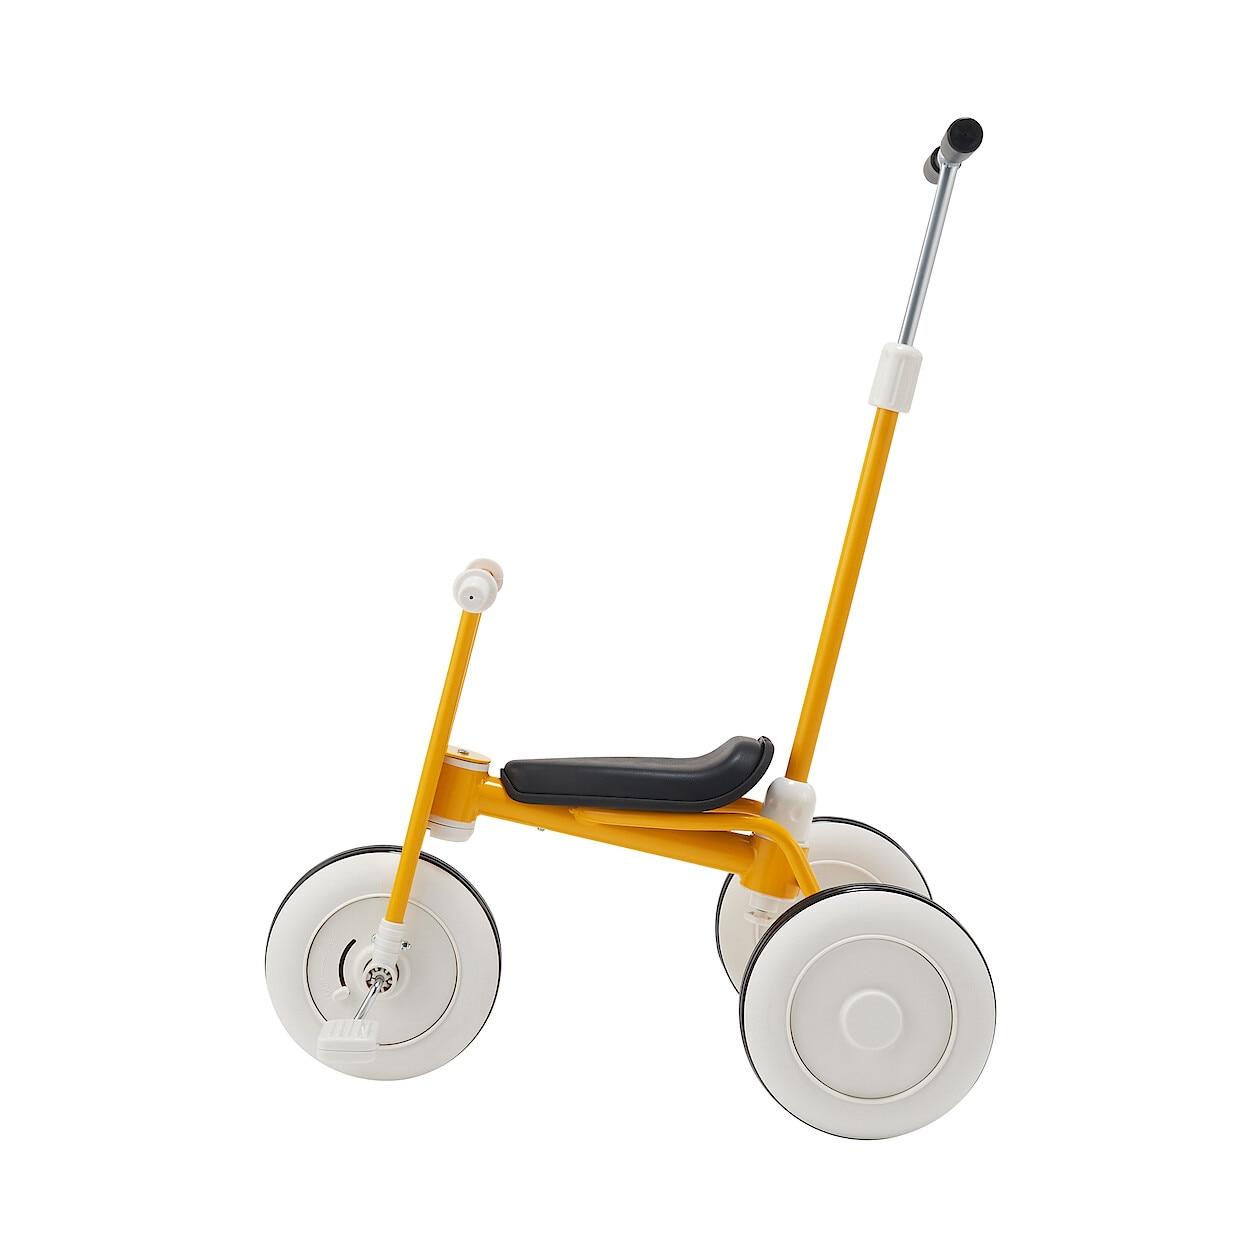 RoomClip商品情報 - 三輪車・舵取り棒付き